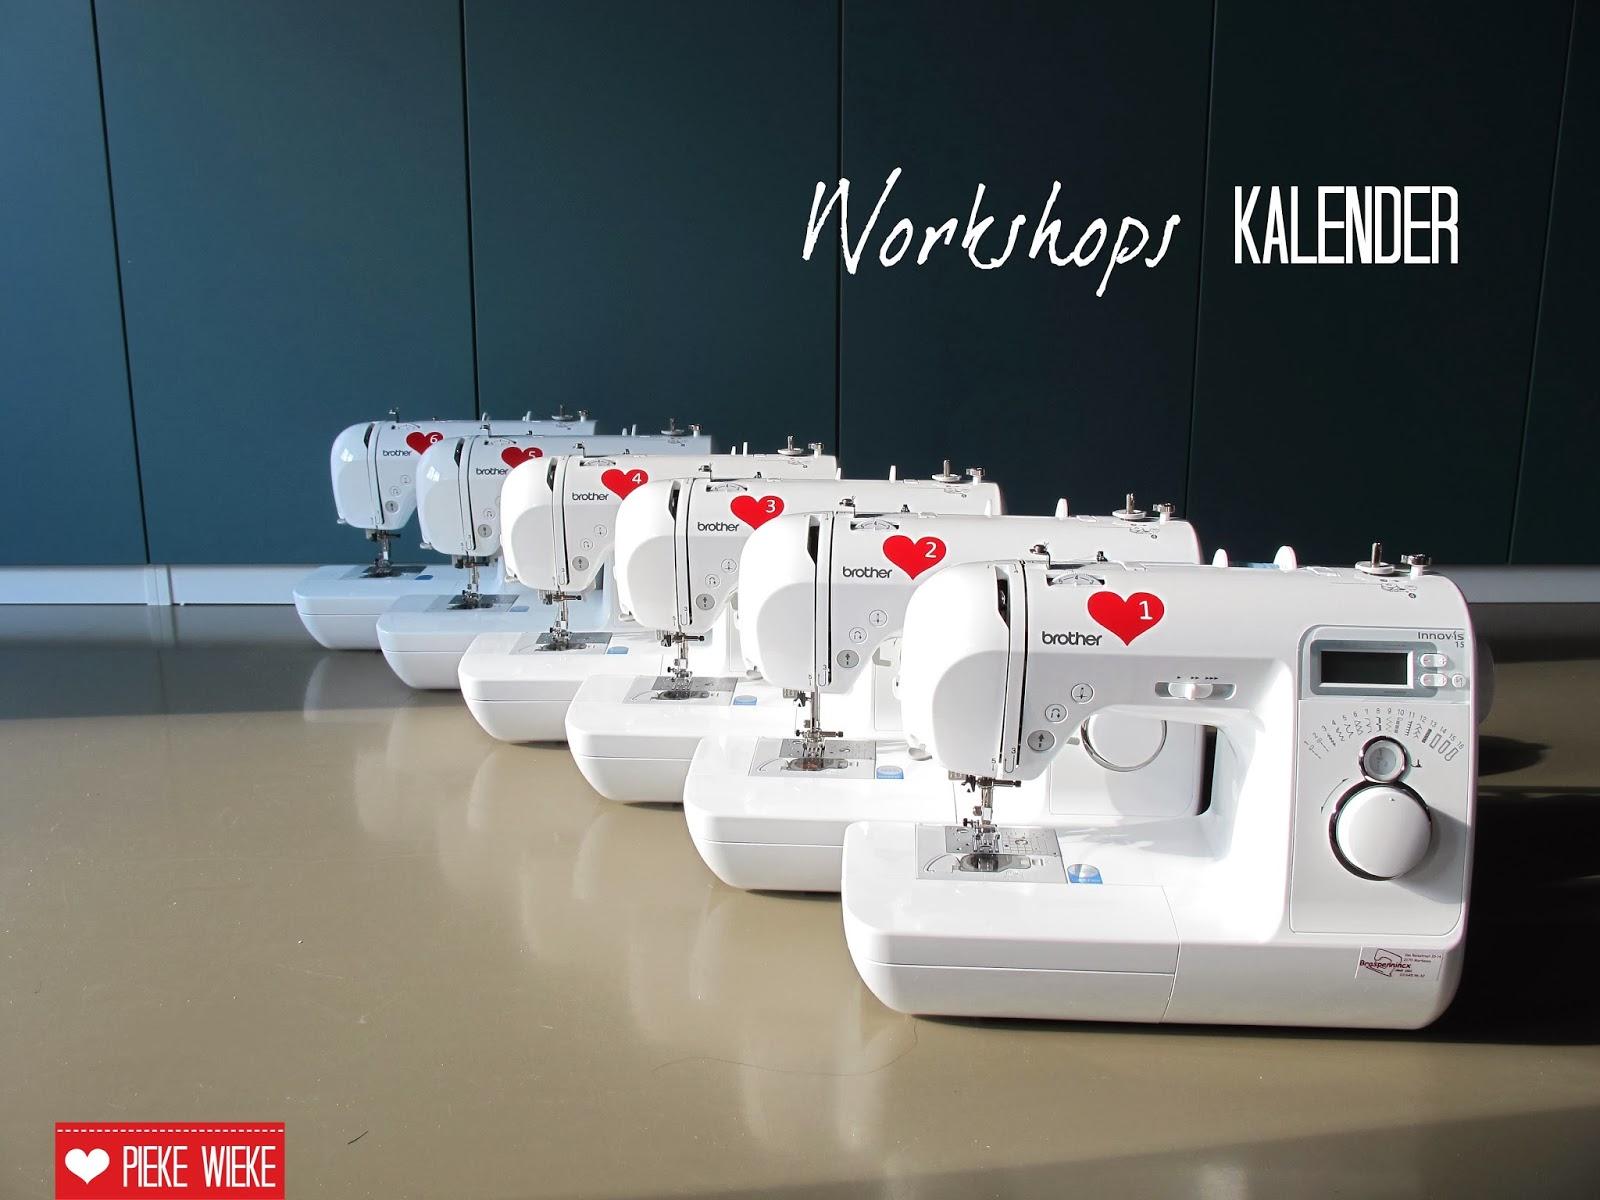 http://piekewieke.blogspot.be/p/workshops.html